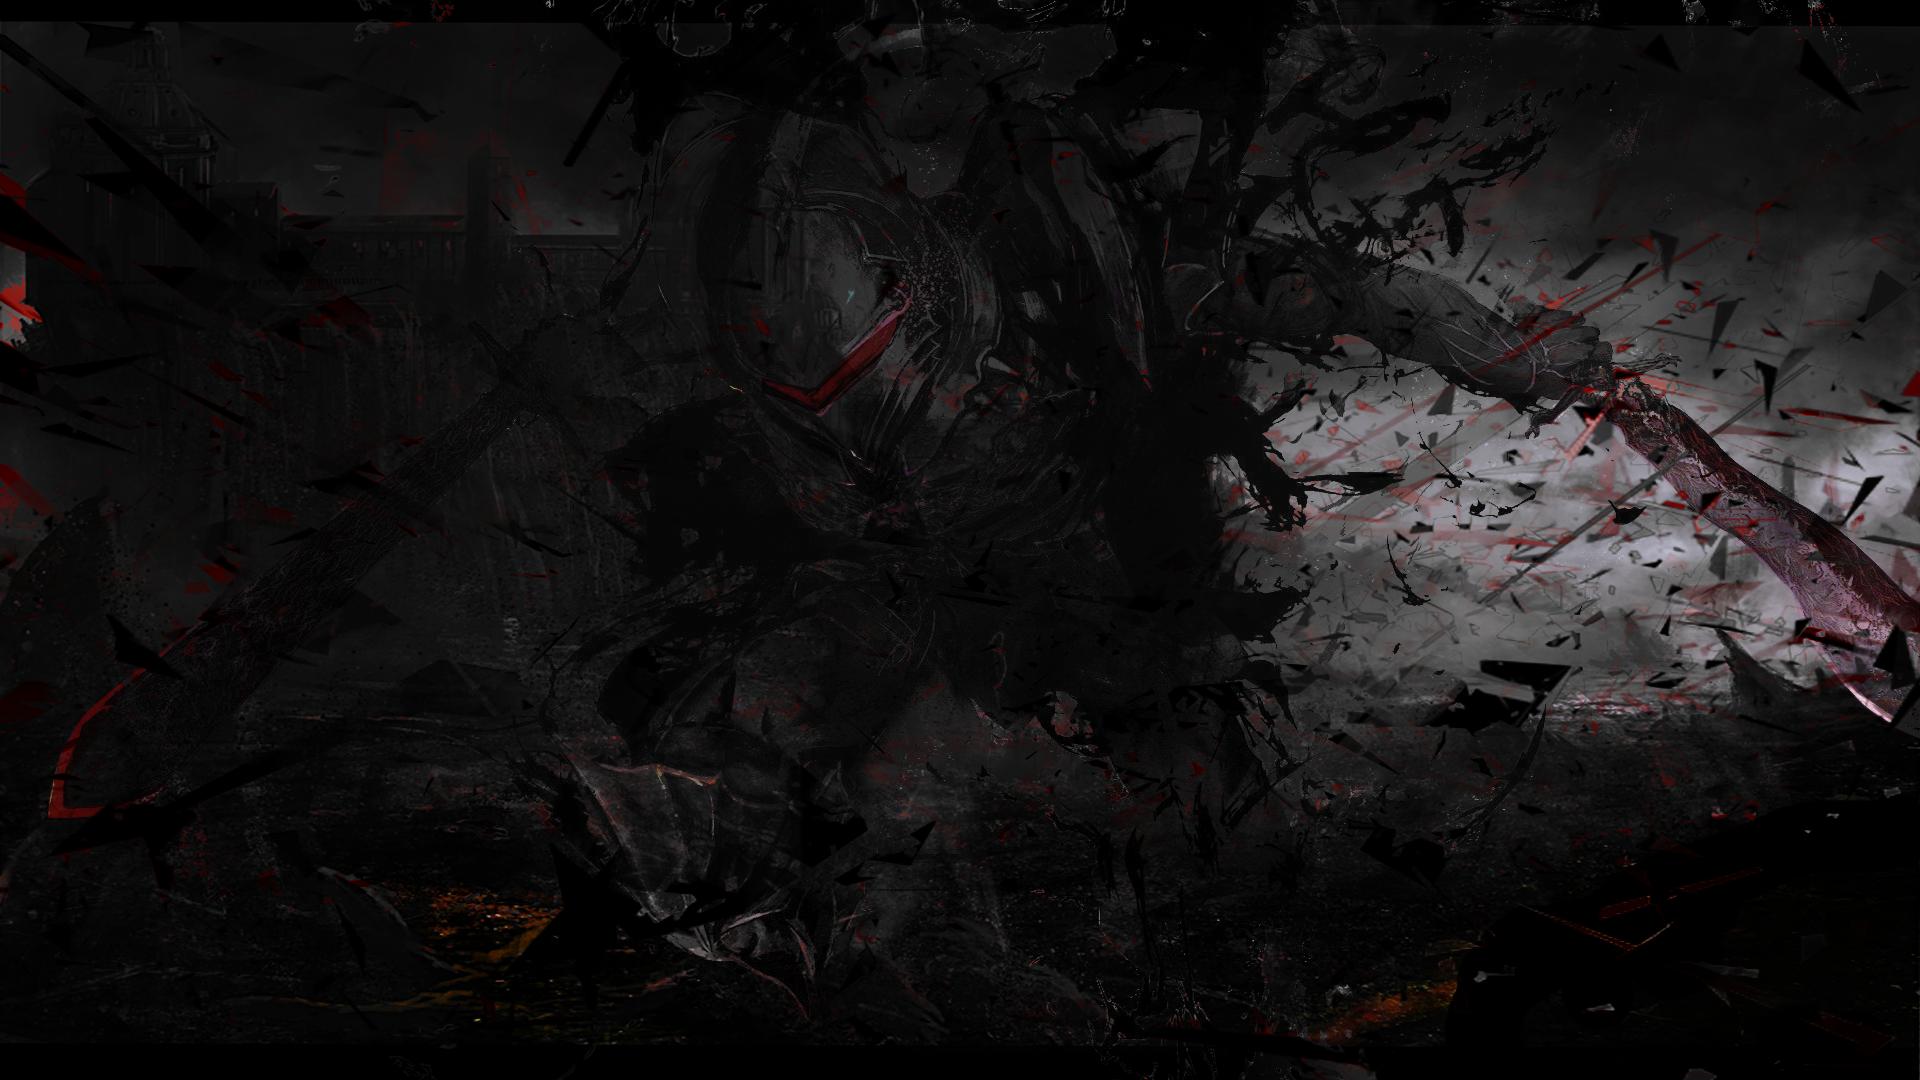 Berserker fate stay zero dark wallpaper background 1920x1080